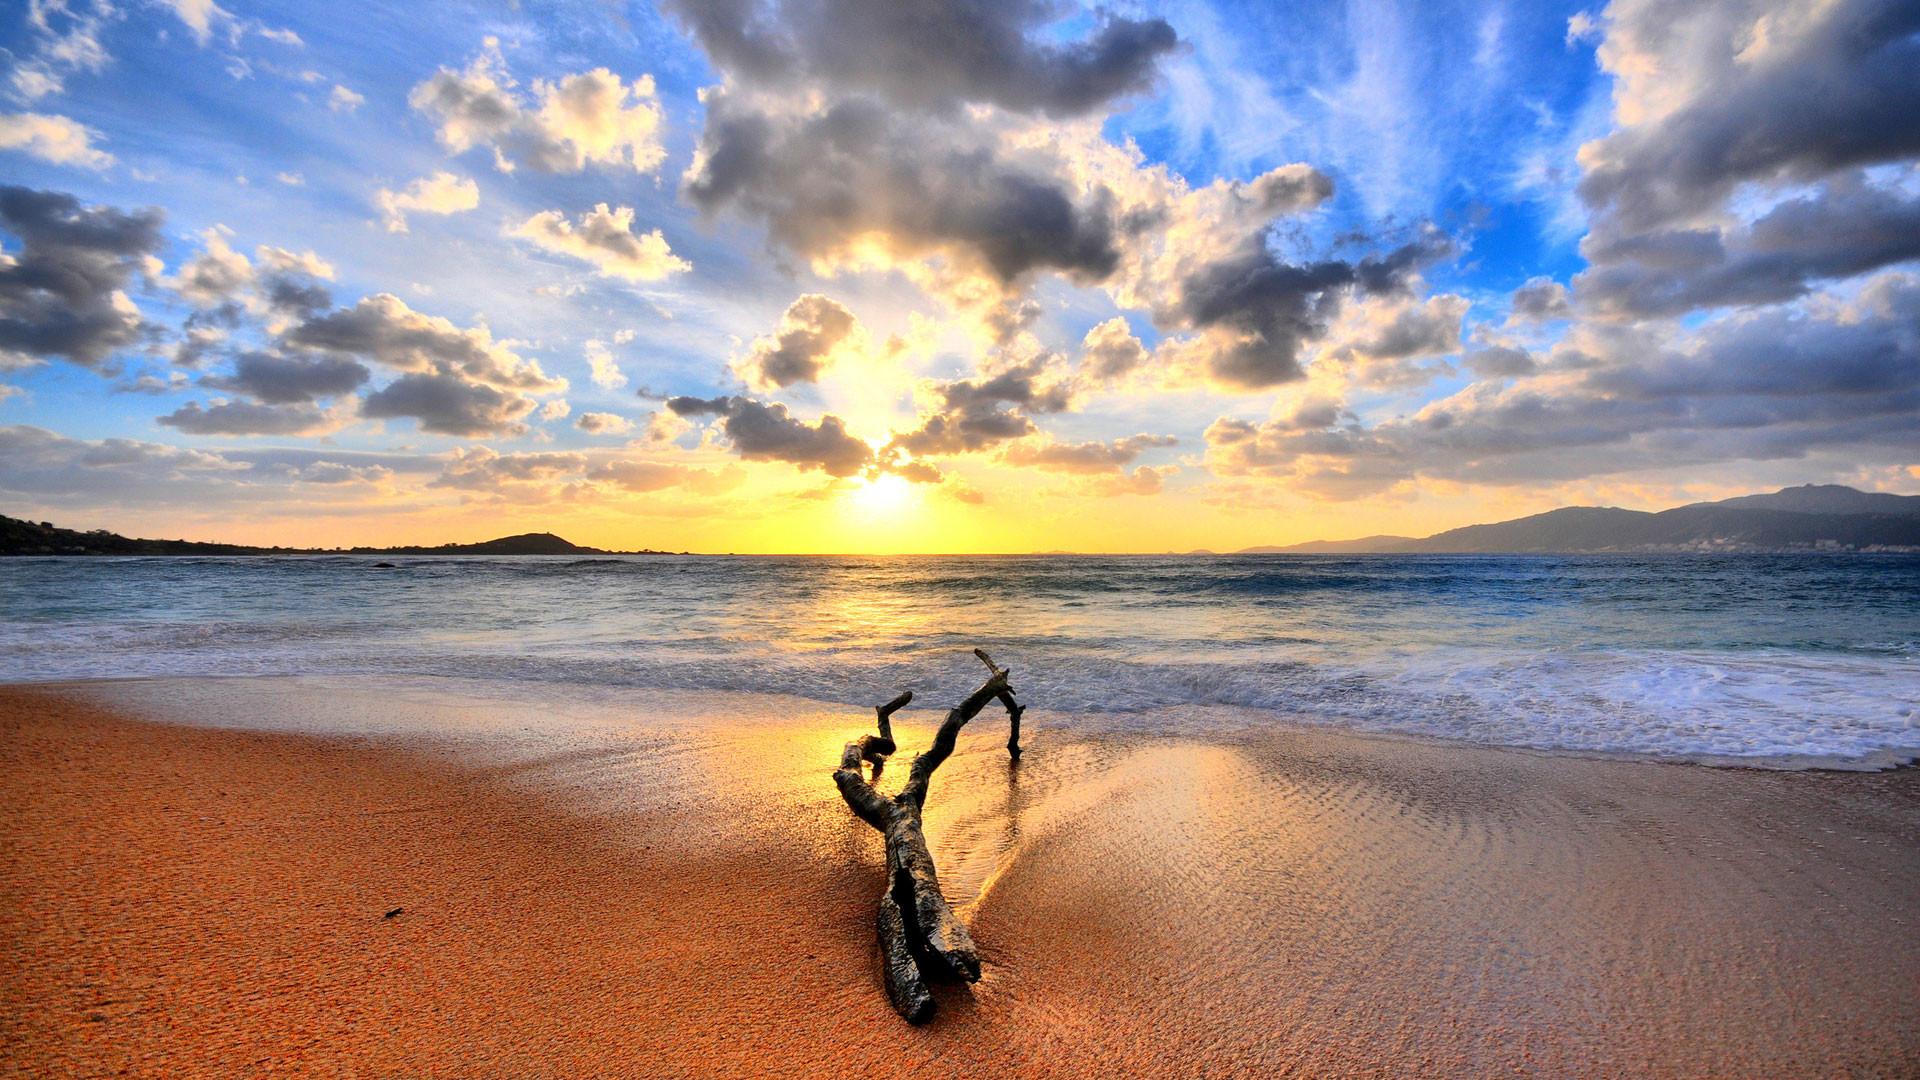 hd pics photos nature beach sky sea shore desktop background wallpaper